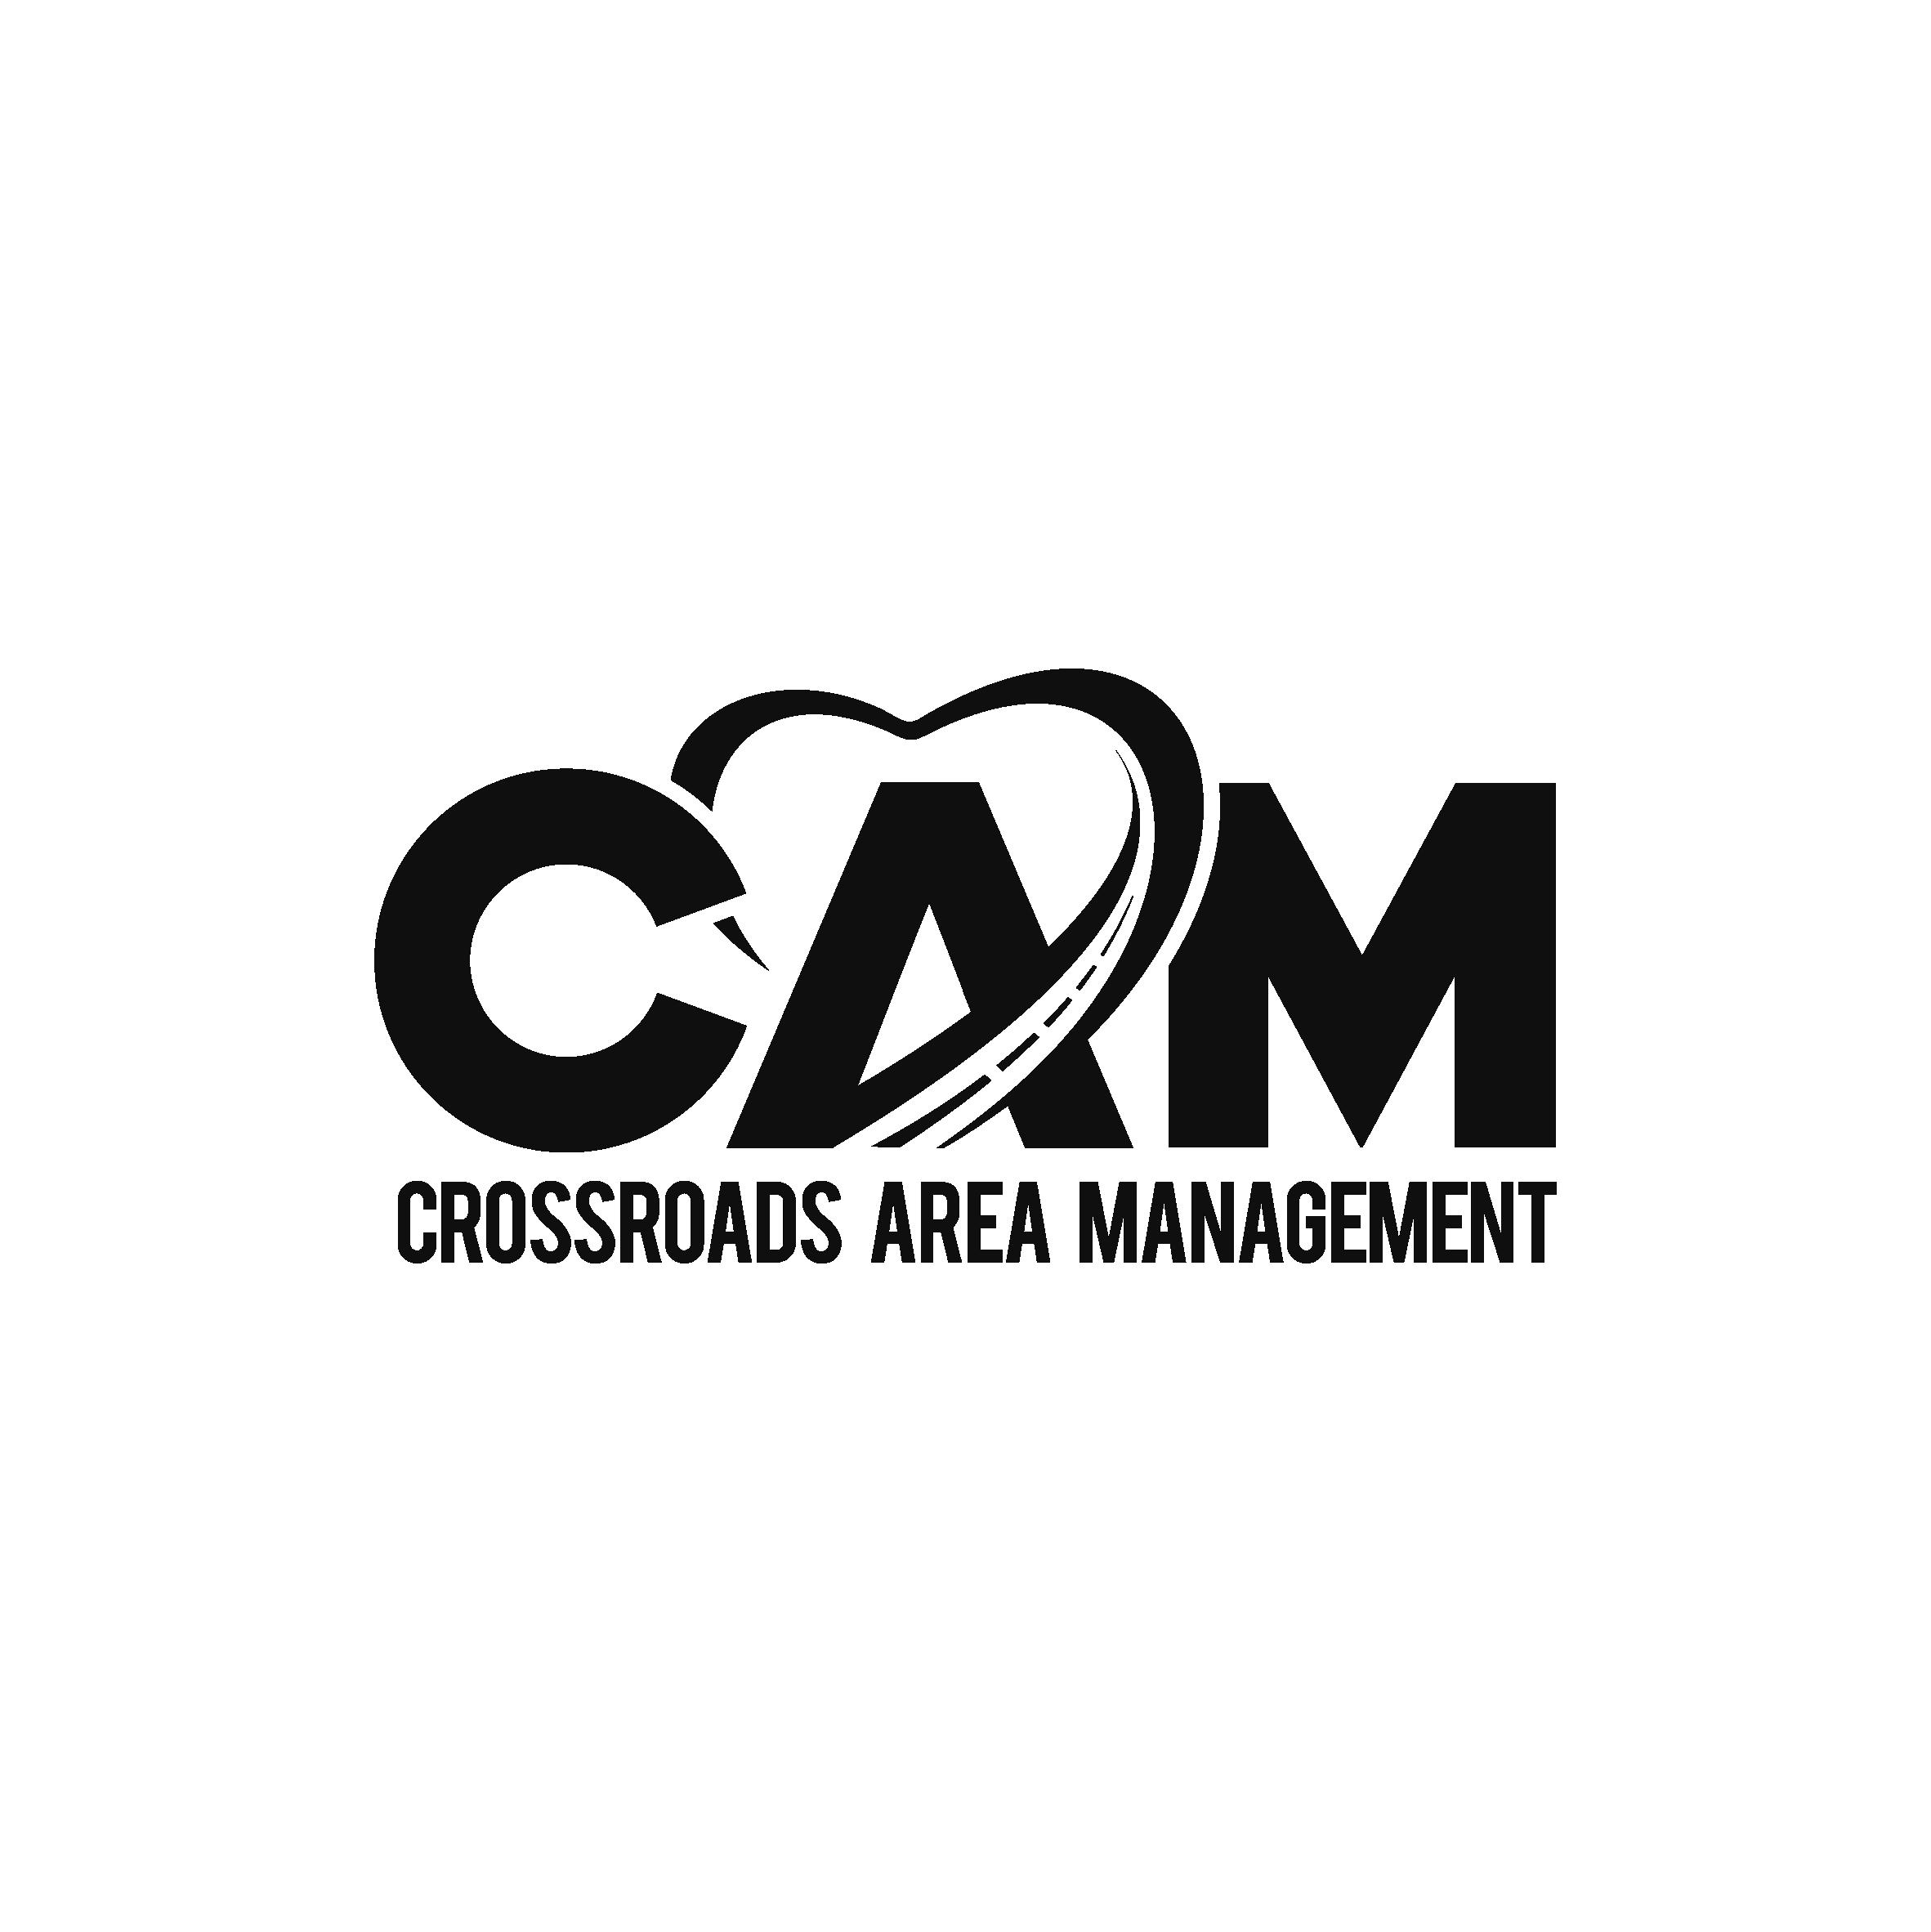 AMAZING Nursing Home company logo that incorporates name of company